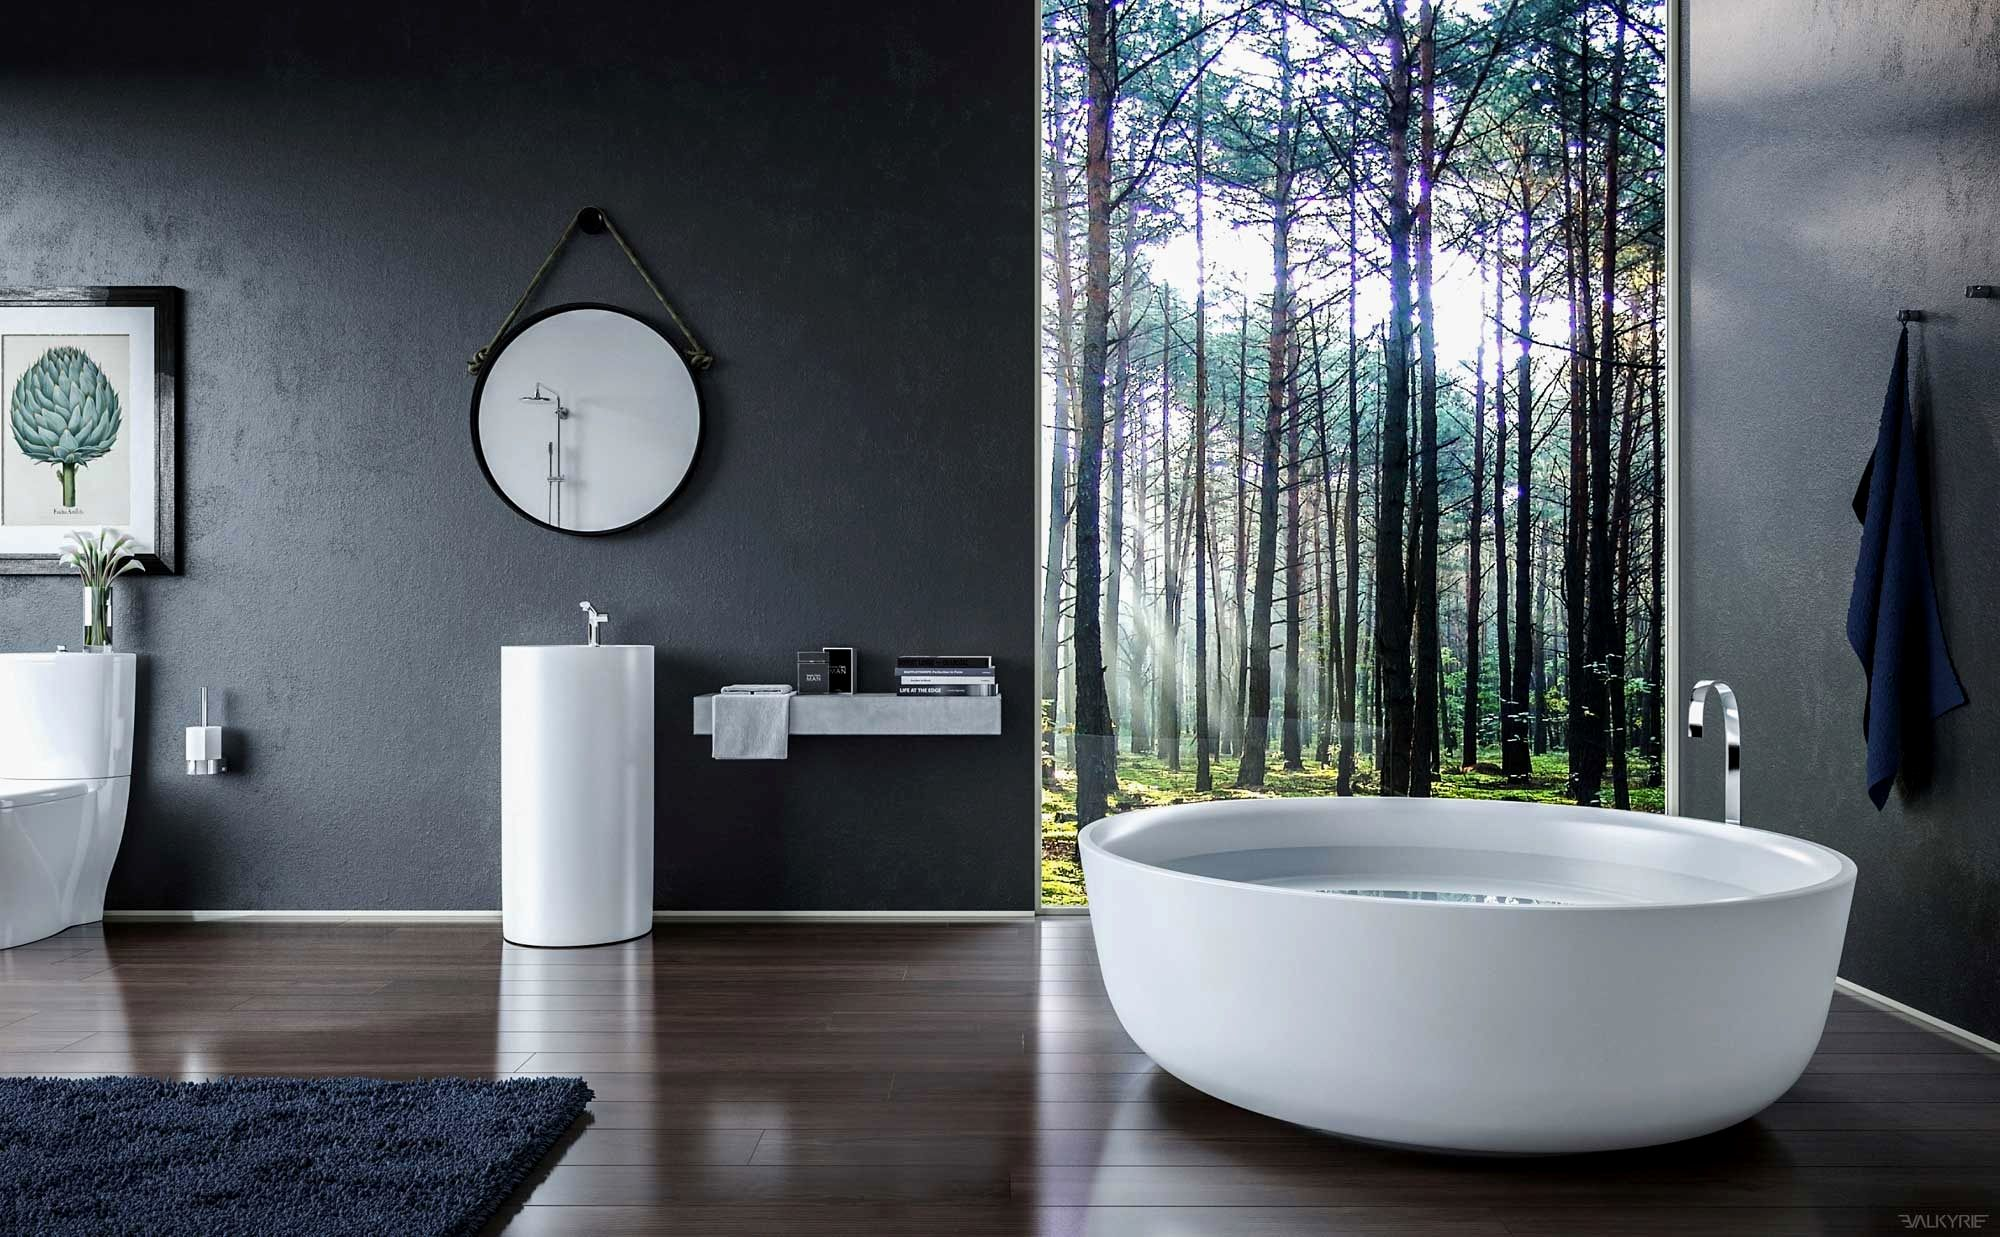 beautiful luxury bathroom faucets design-Excellent Luxury Bathroom Faucets Model